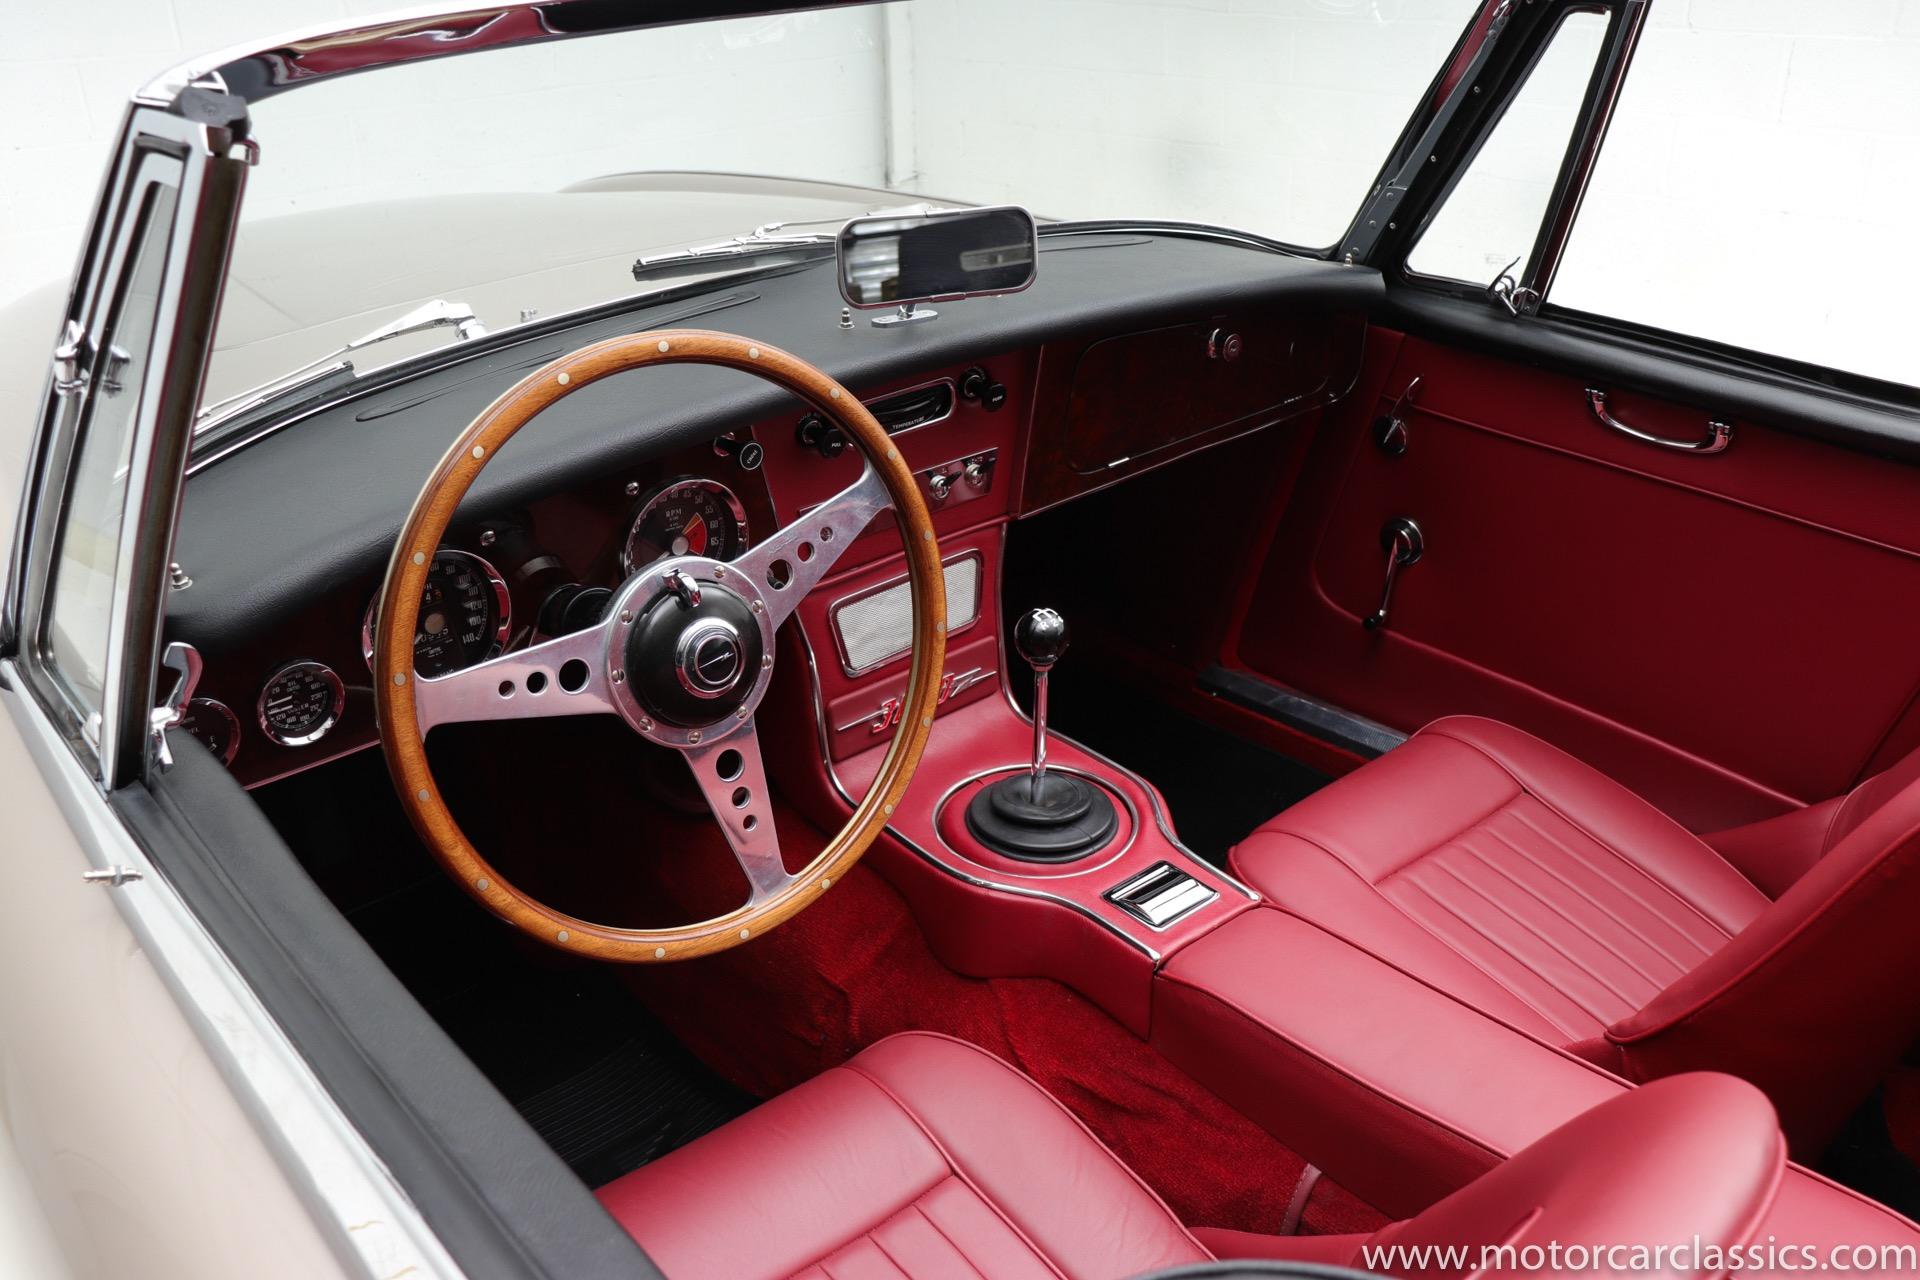 1964 Austin-Healey 3000 MKIII Convertible Phase II RWD